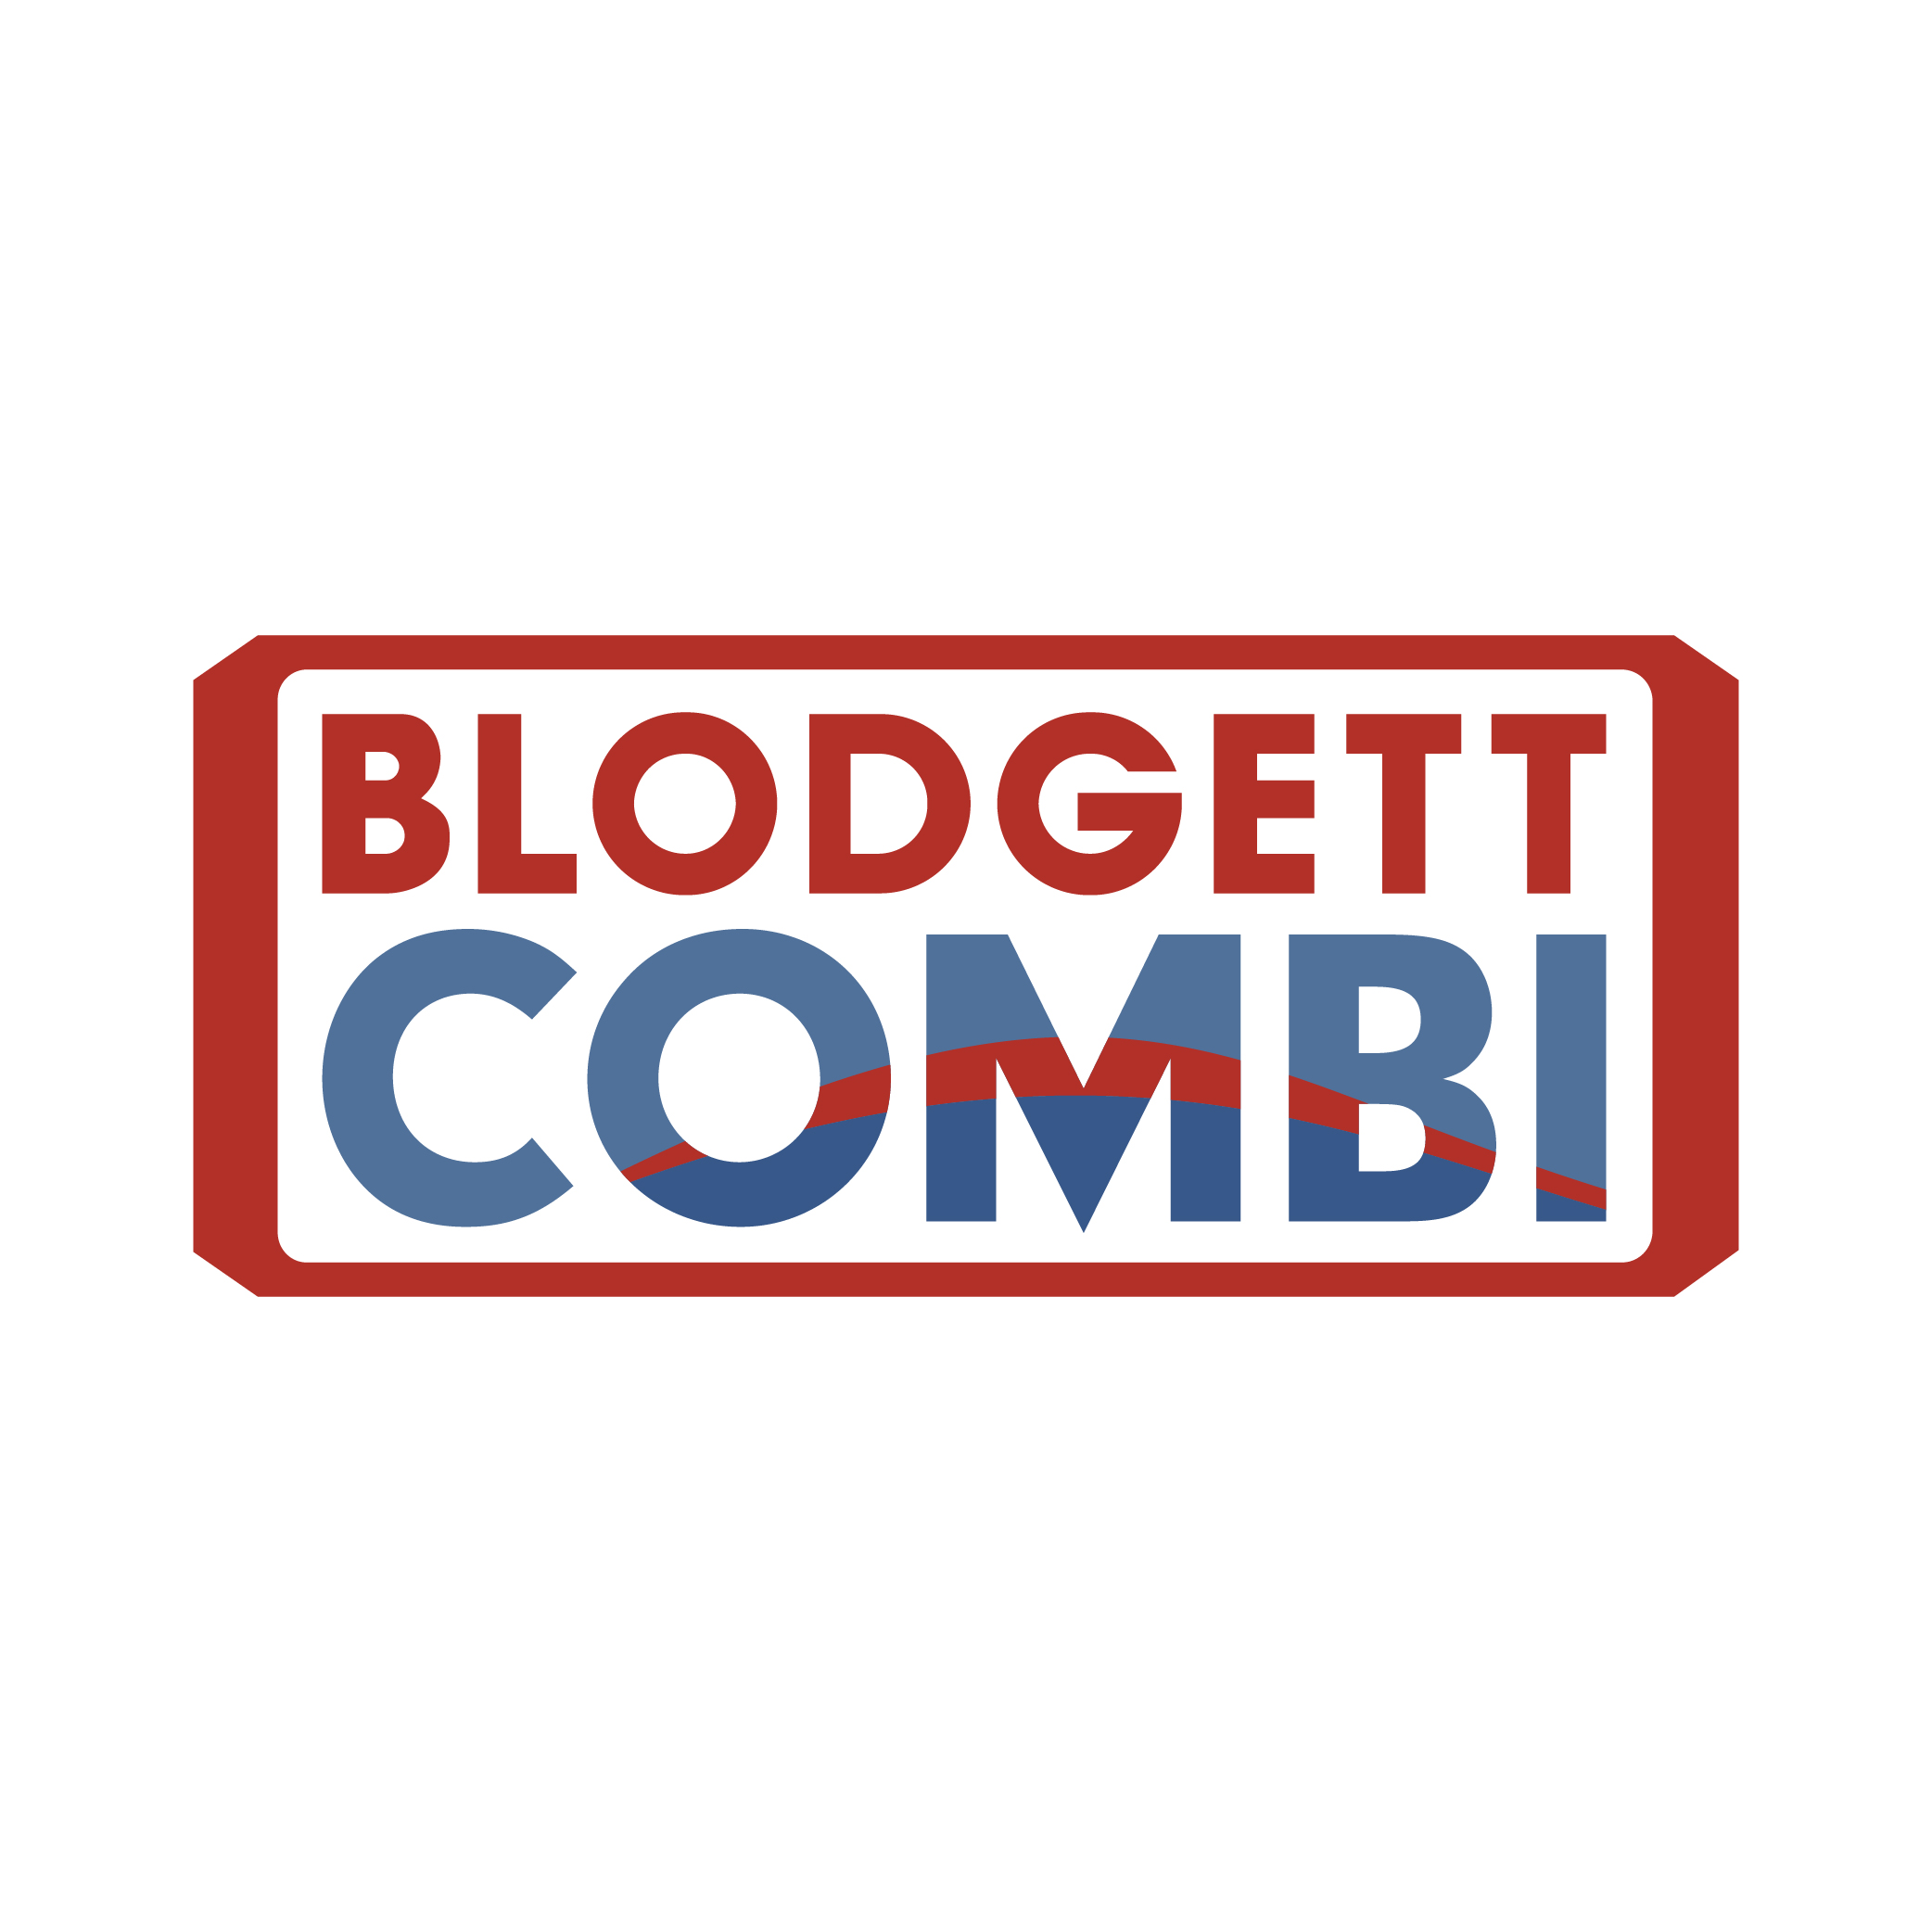 Blodgett Combi